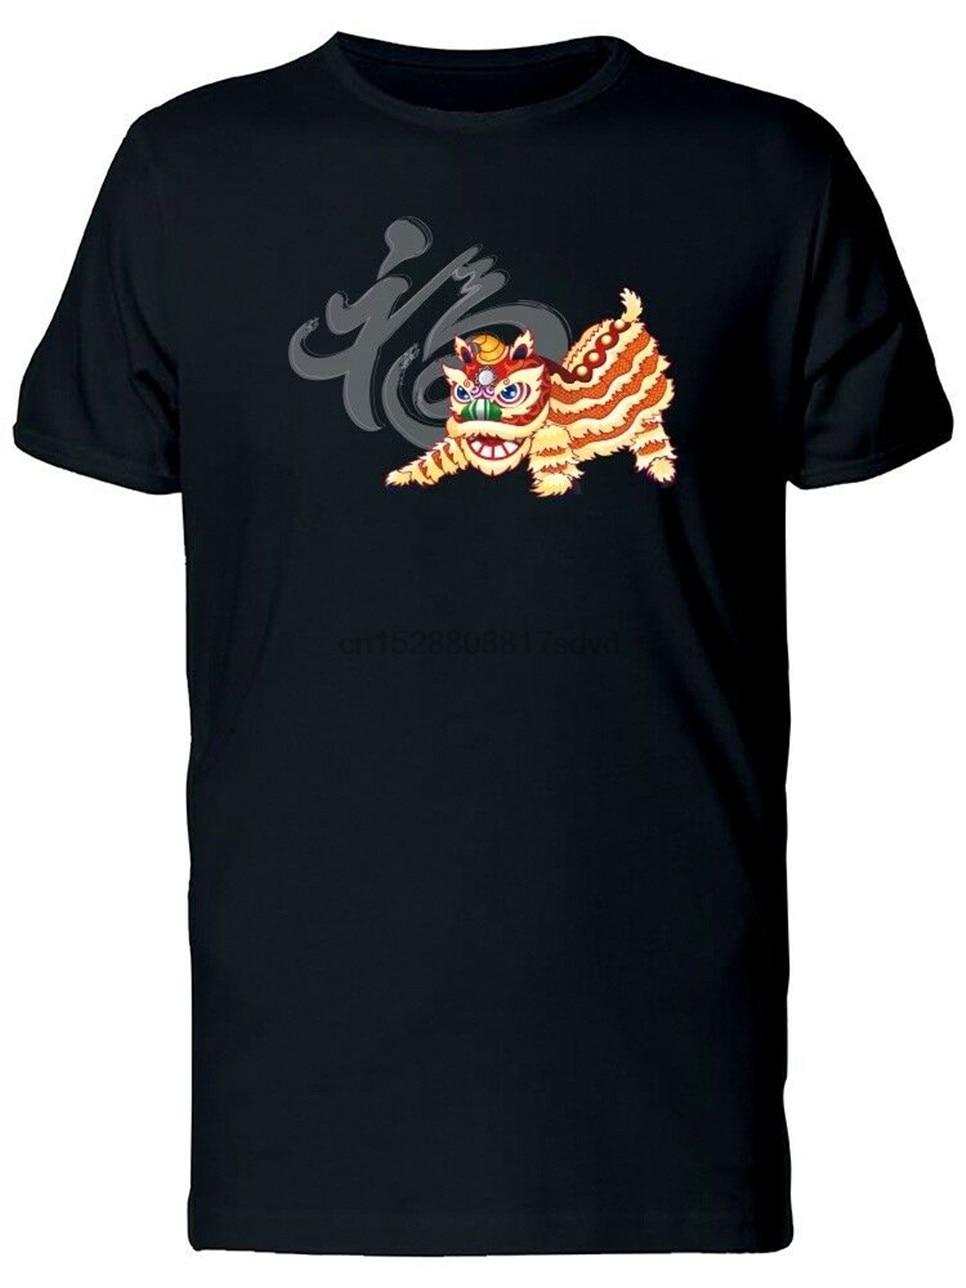 Chino danza del león MenS Tee-imagen alto Tee Shirt